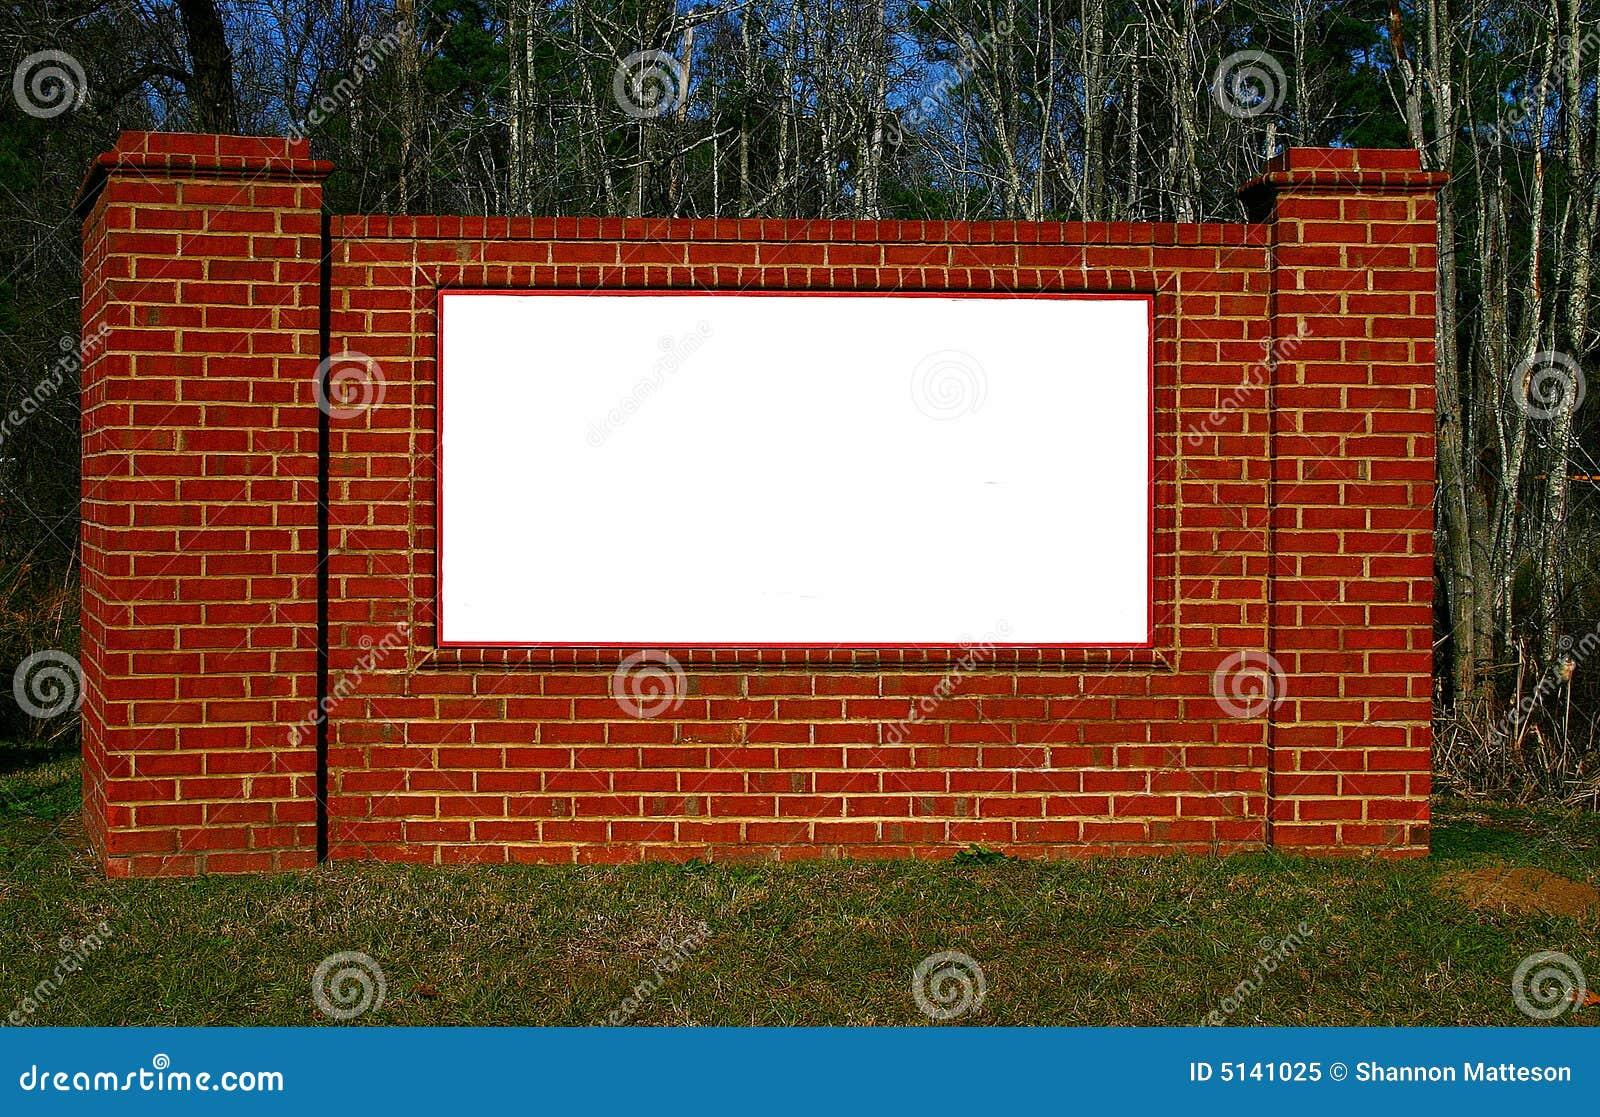 Brick Sign Royalty Free Stock Photo Image 5141025